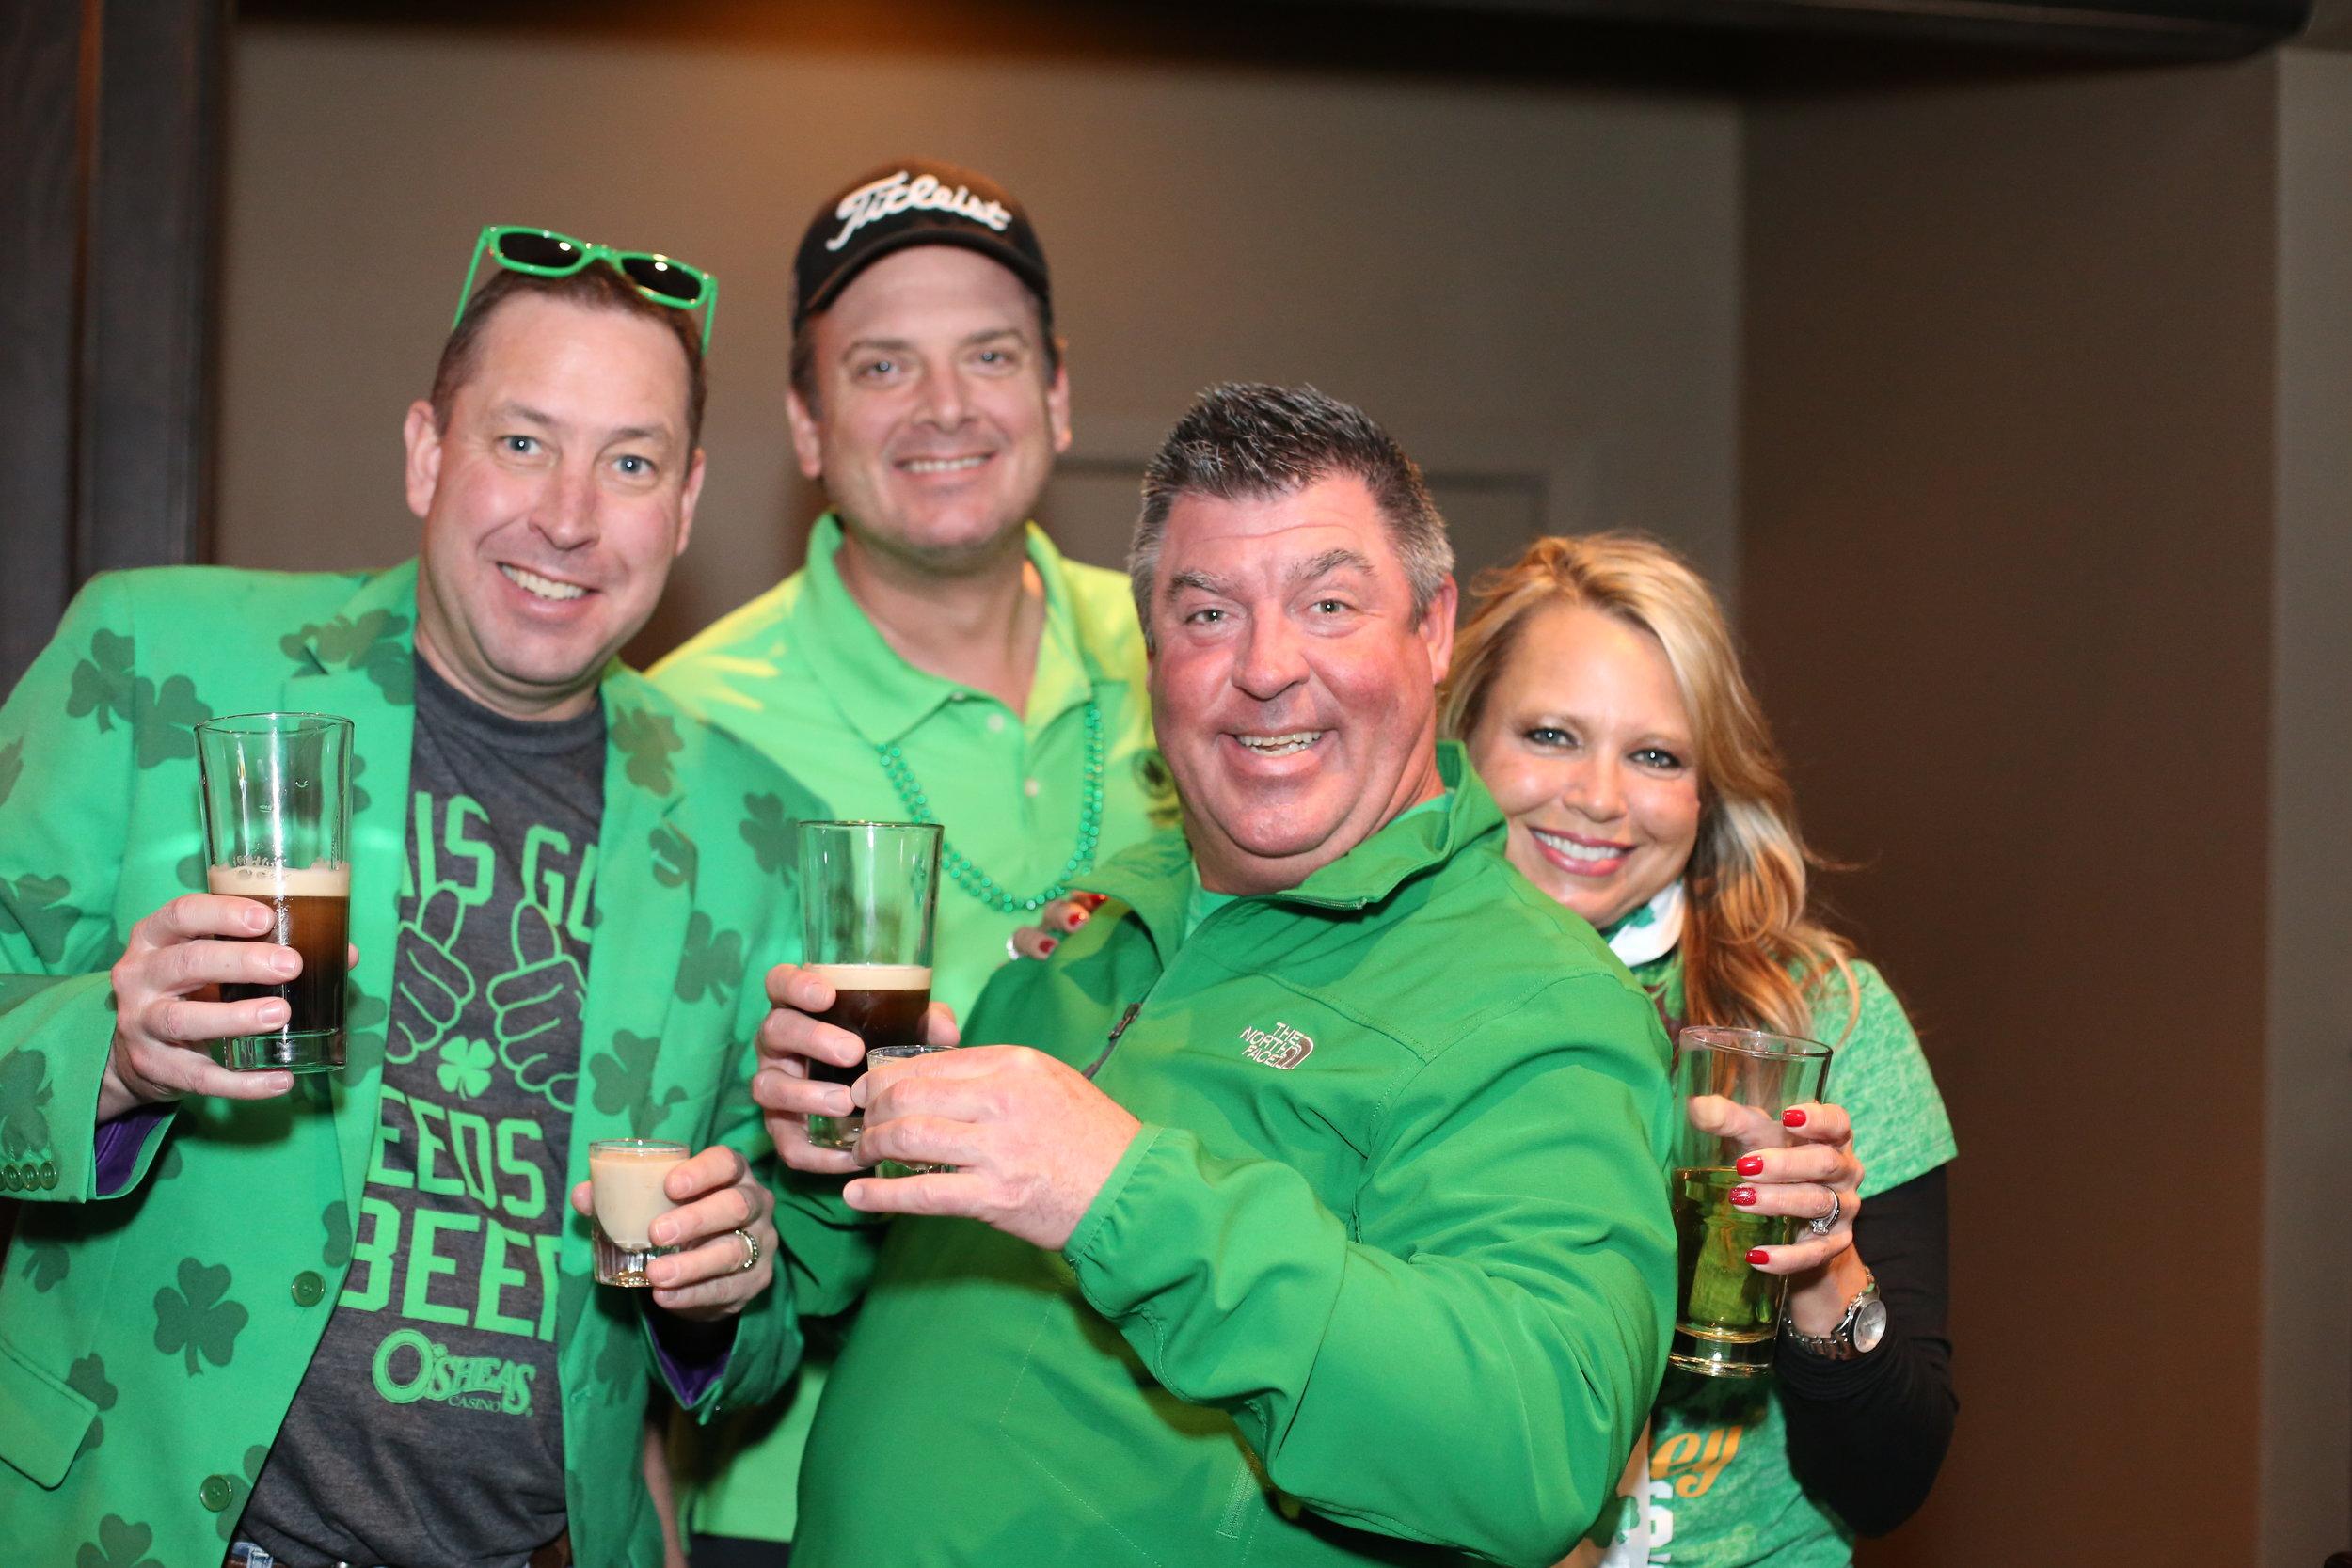 Good times at The Irish